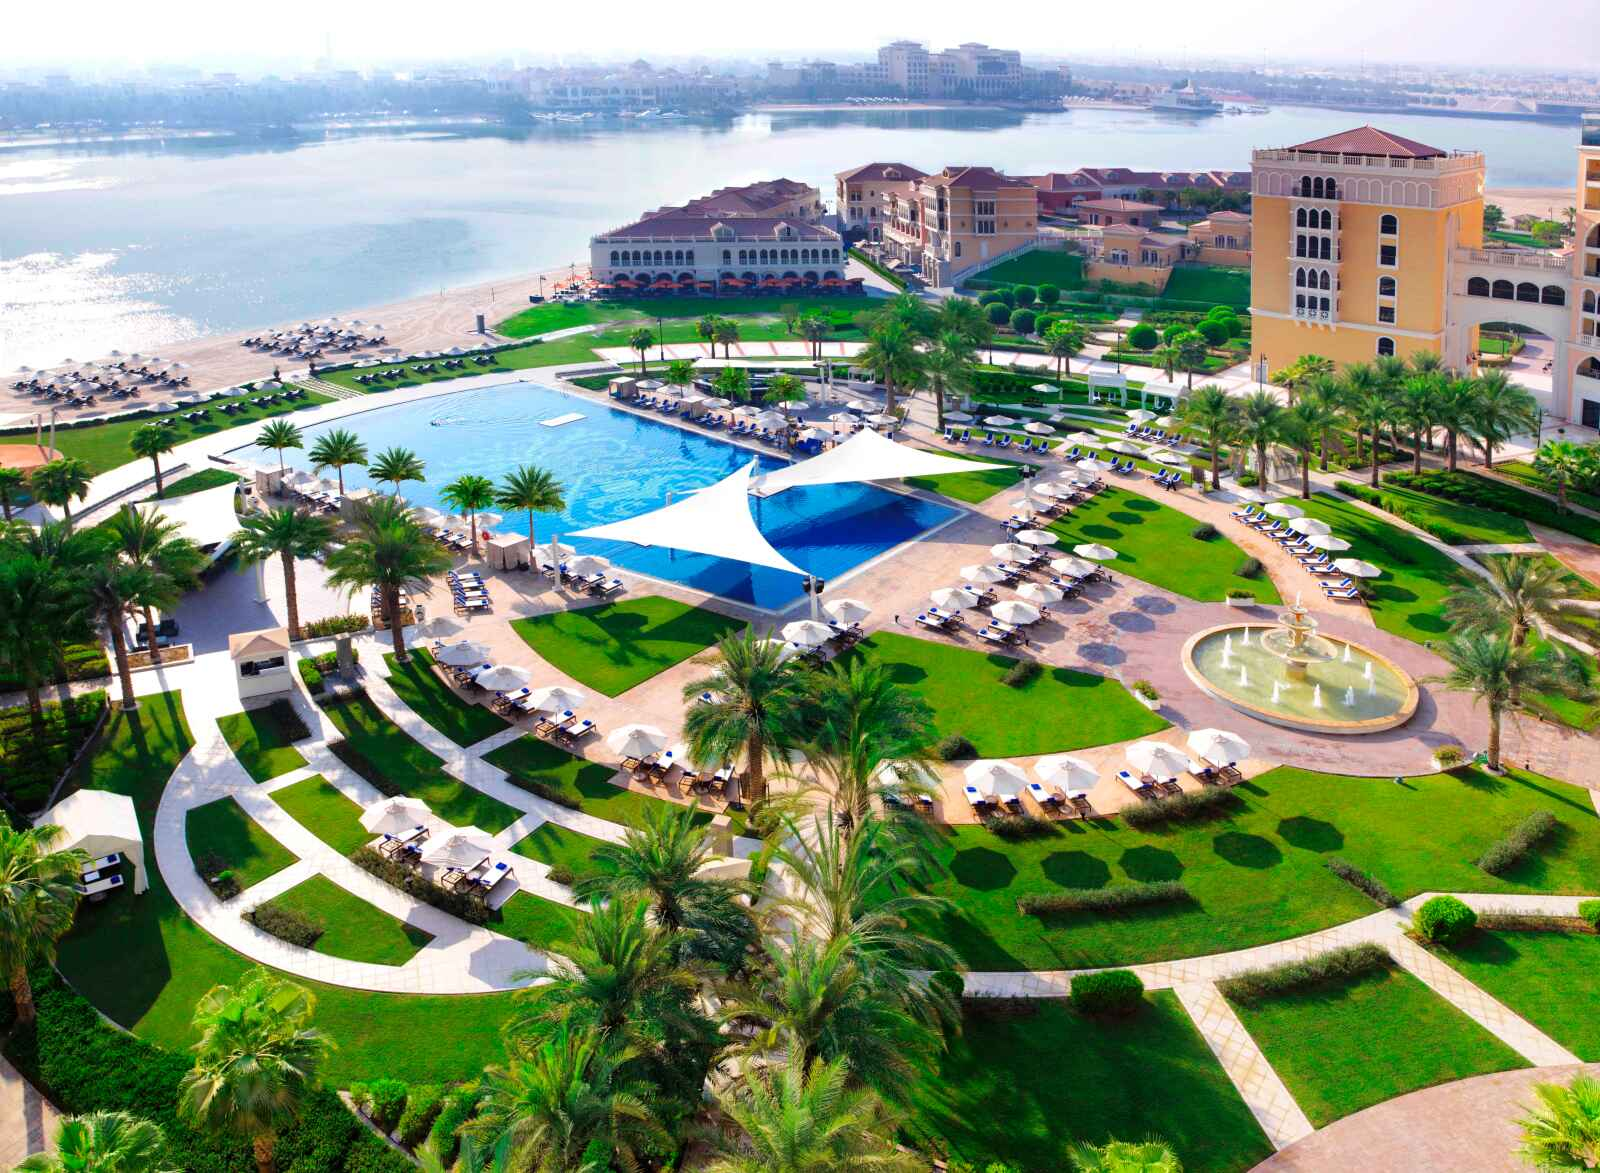 Abou Dhabi : The Ritz Carlton Abu Dhabi, Grand Canal